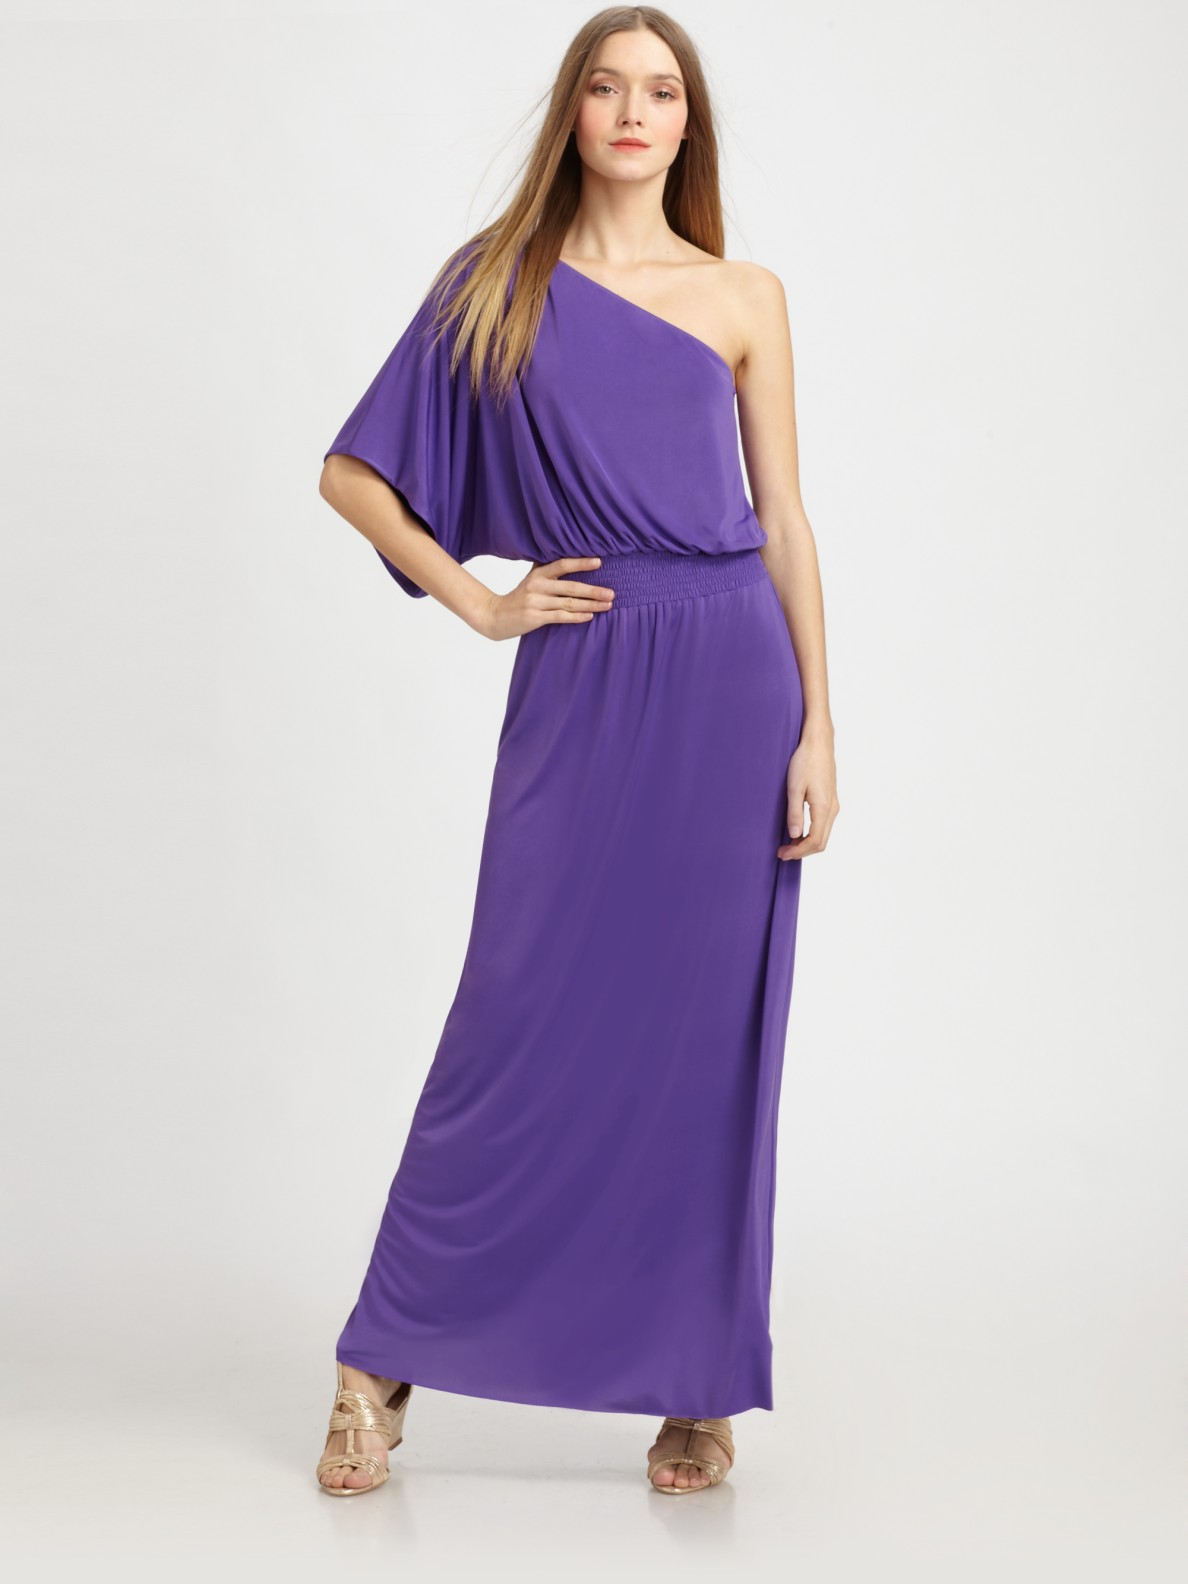 Long Purple Maxi Dresses